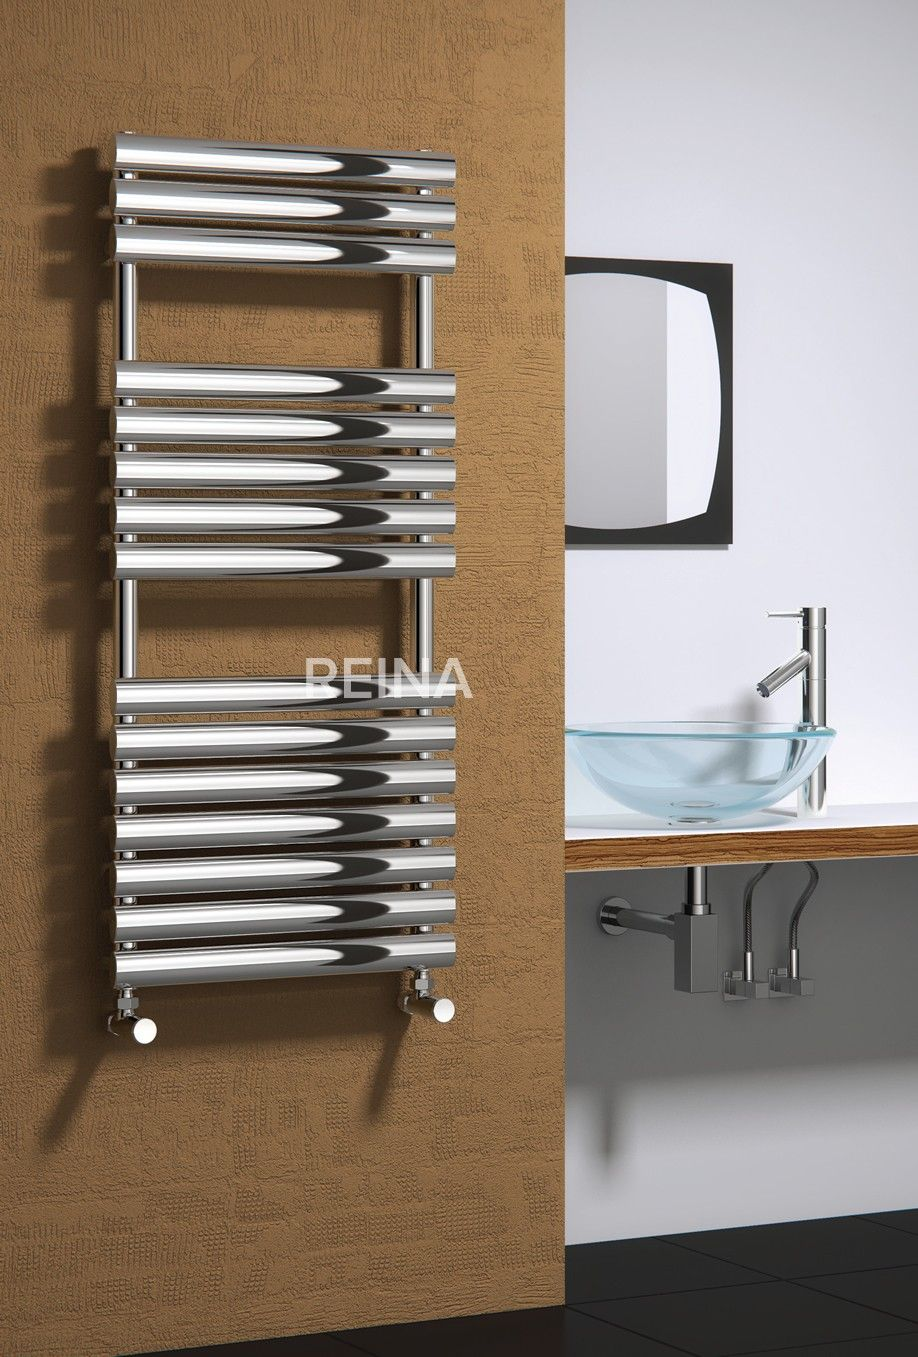 Reina Helin Stainless Steel Heated Towel Rails Stainless Steel Bathroom Towel Rail